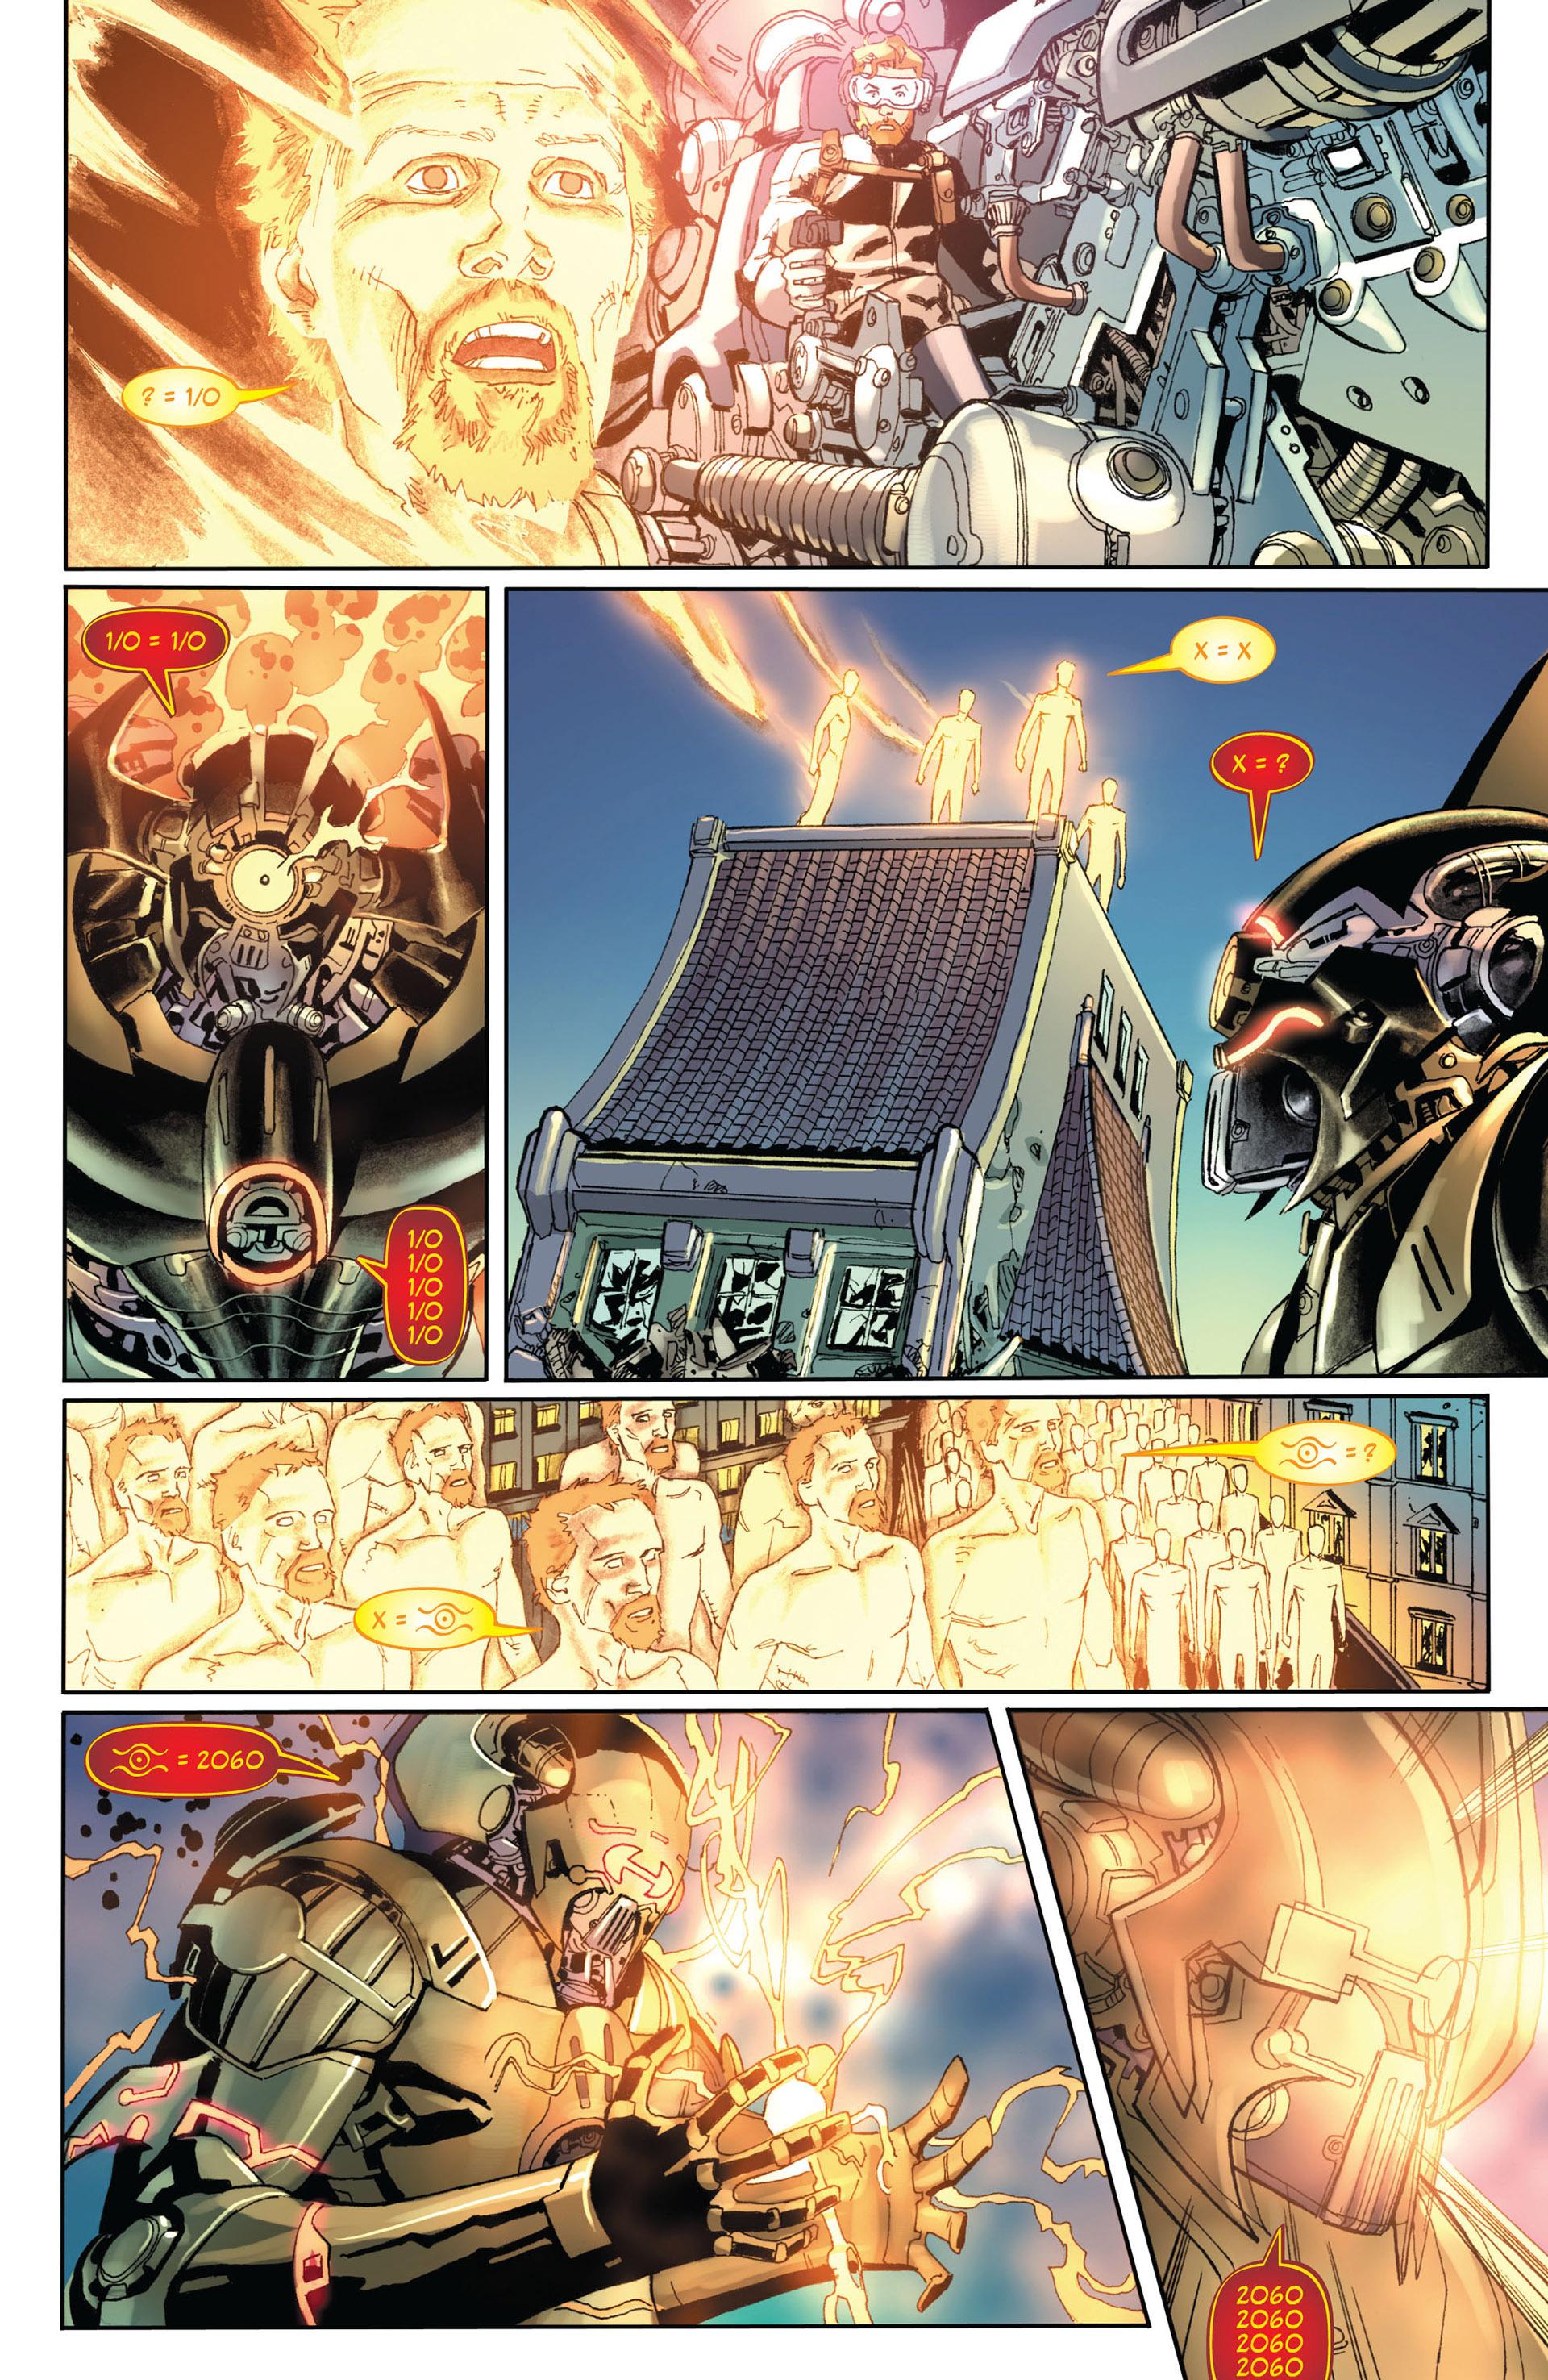 shield marvel comics